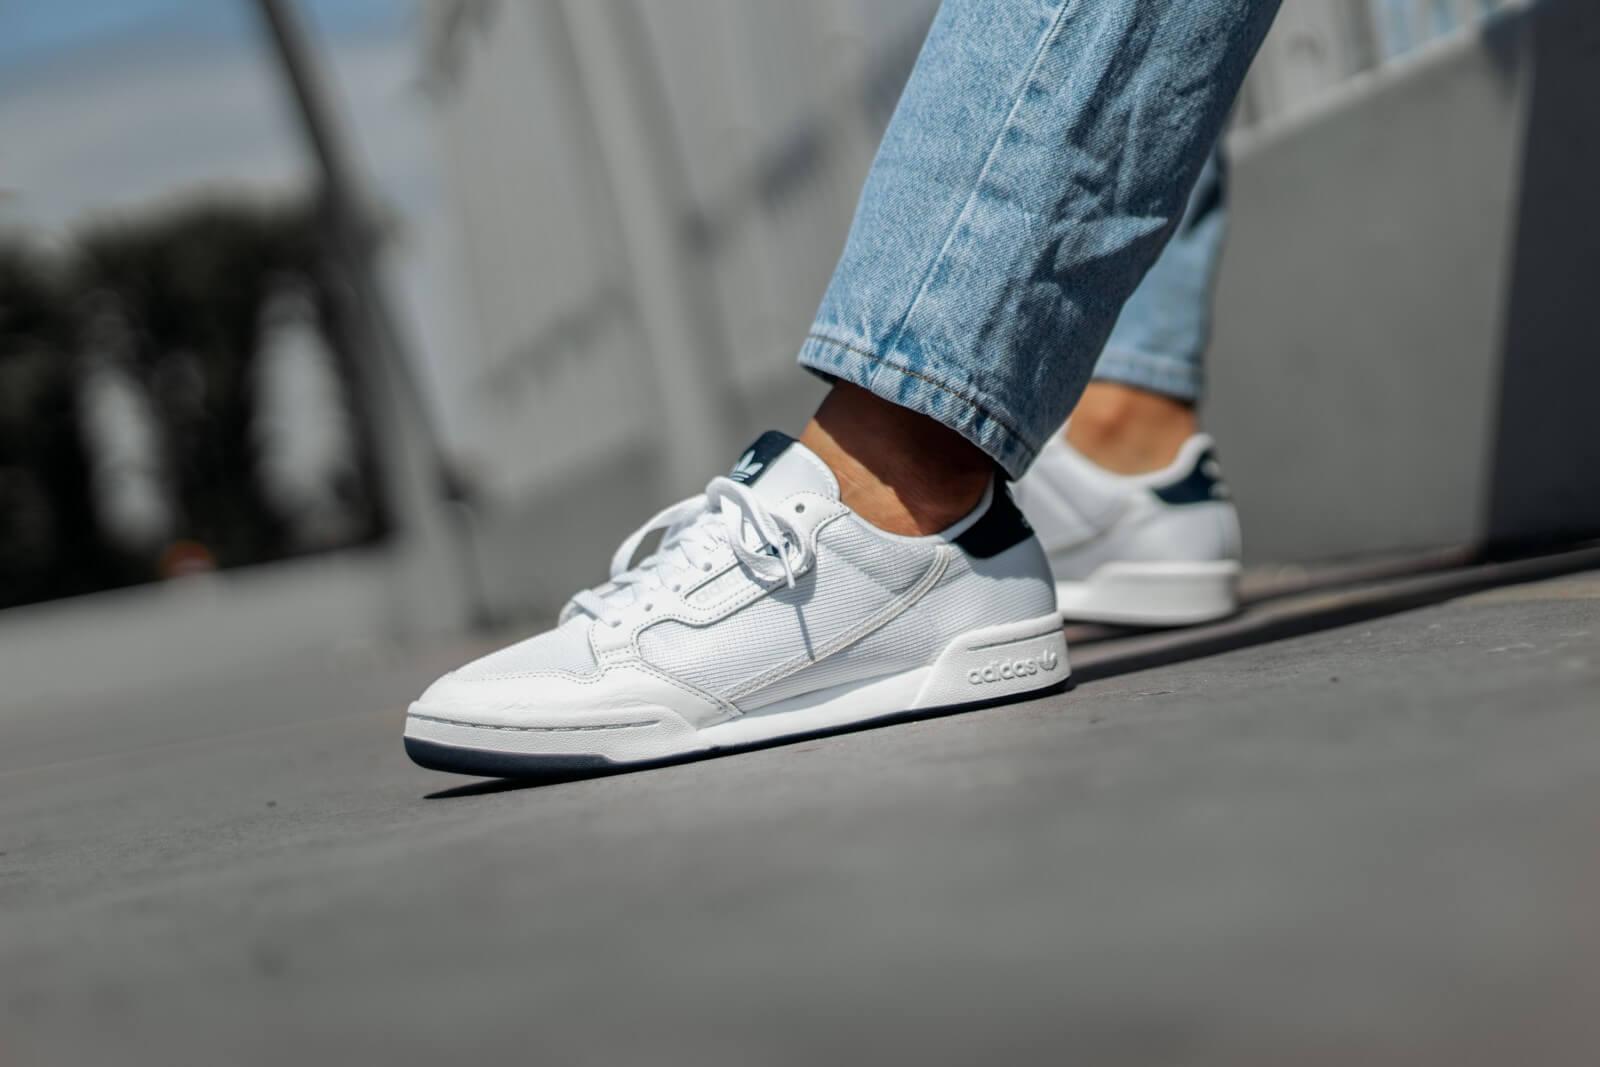 Adidas Continental 80 Cloud White/Grey